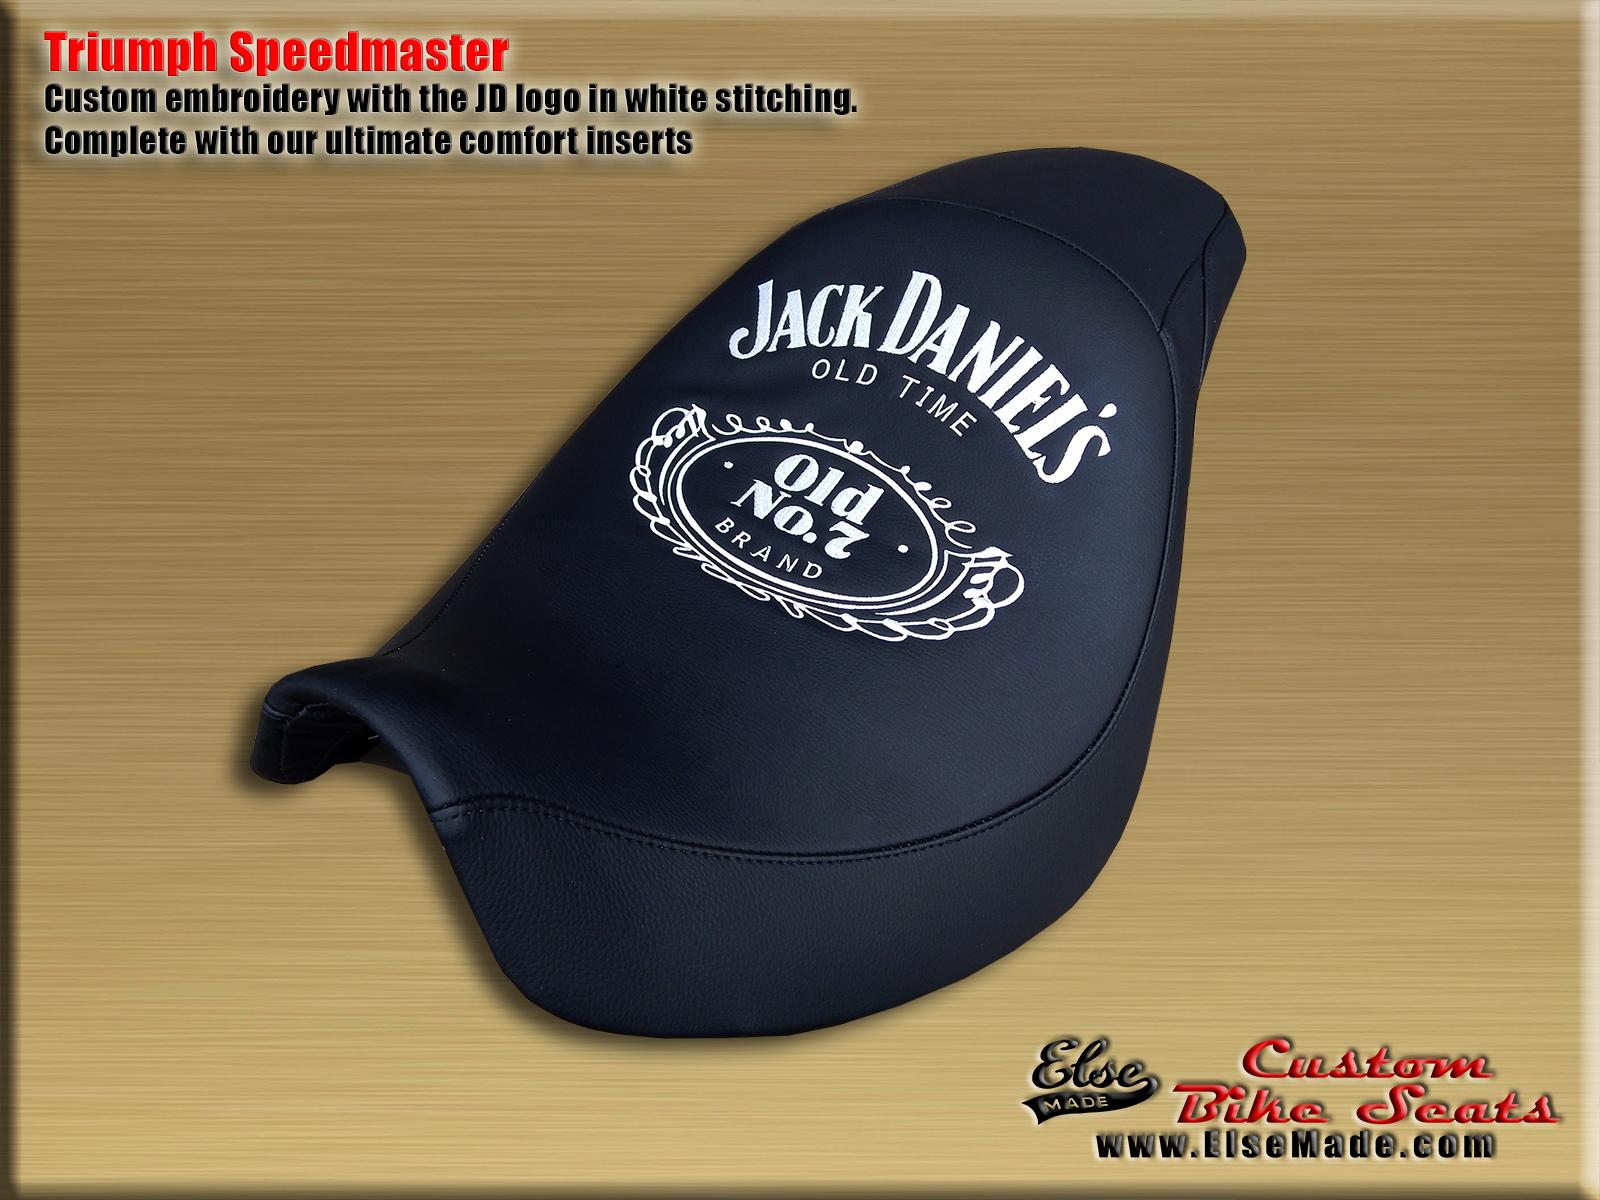 speedmaster jd fs 1600.jpg